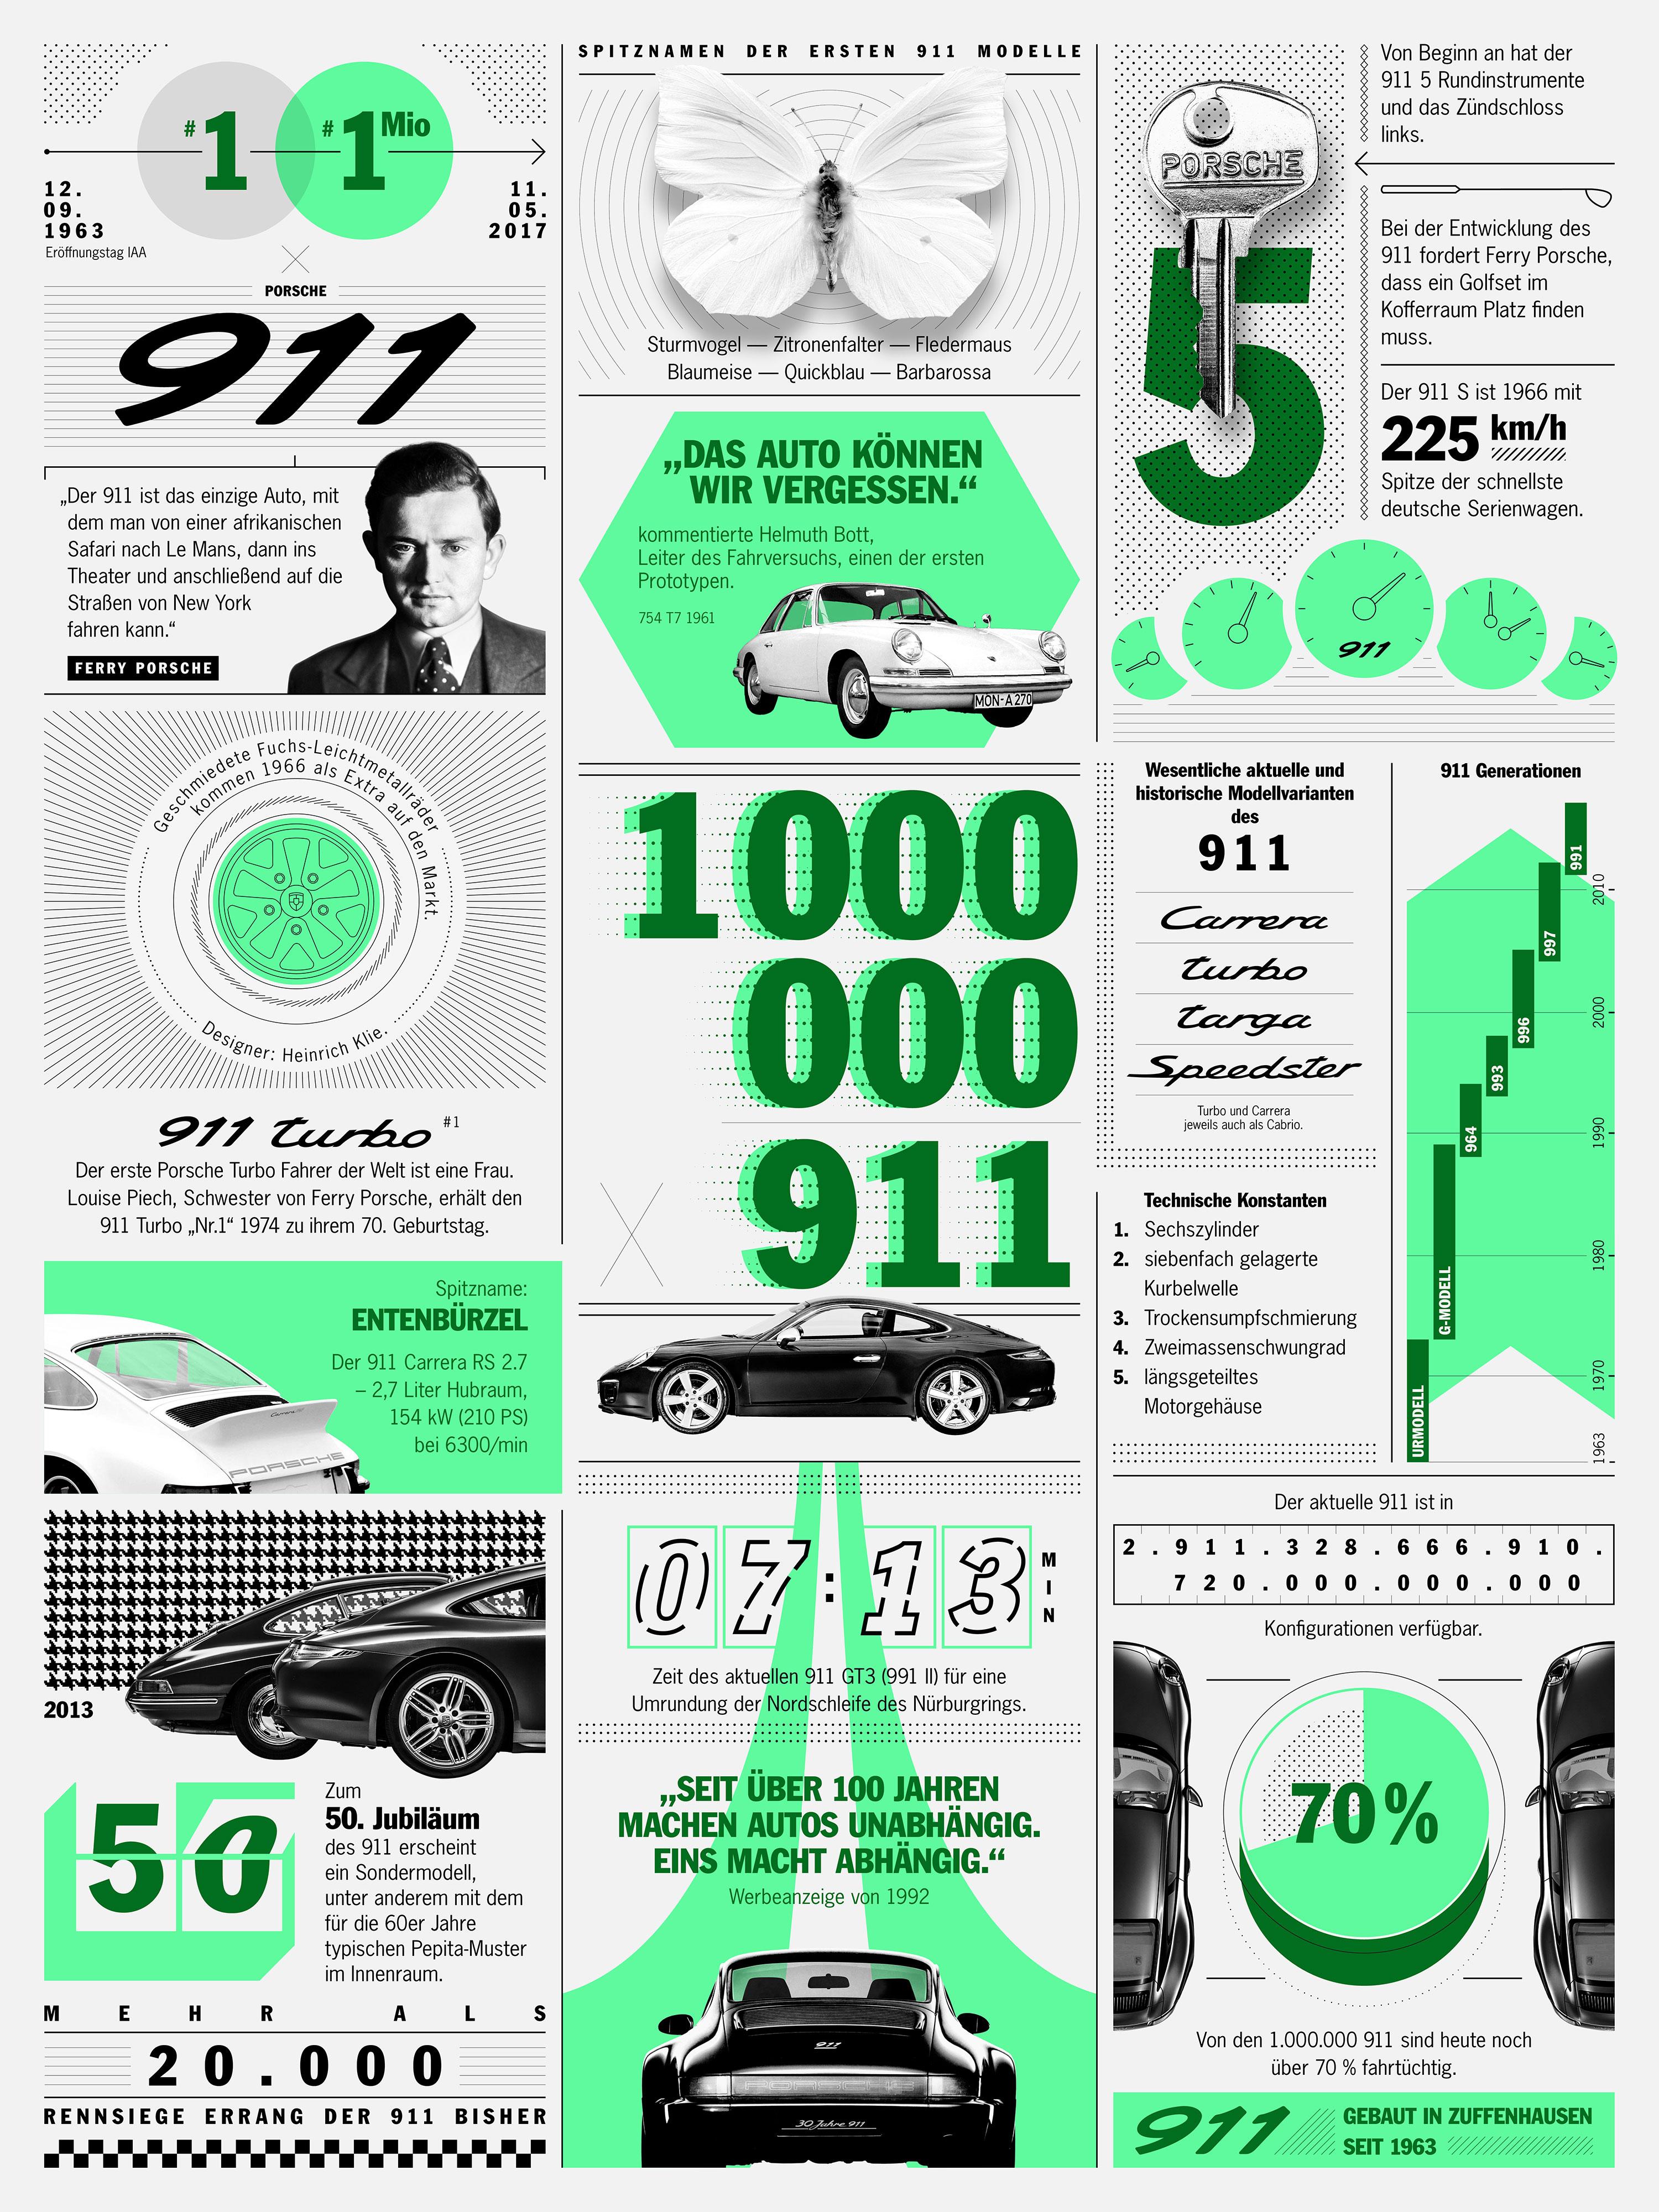 Einmillionster 911, Infografik, 2017, Porsche AG